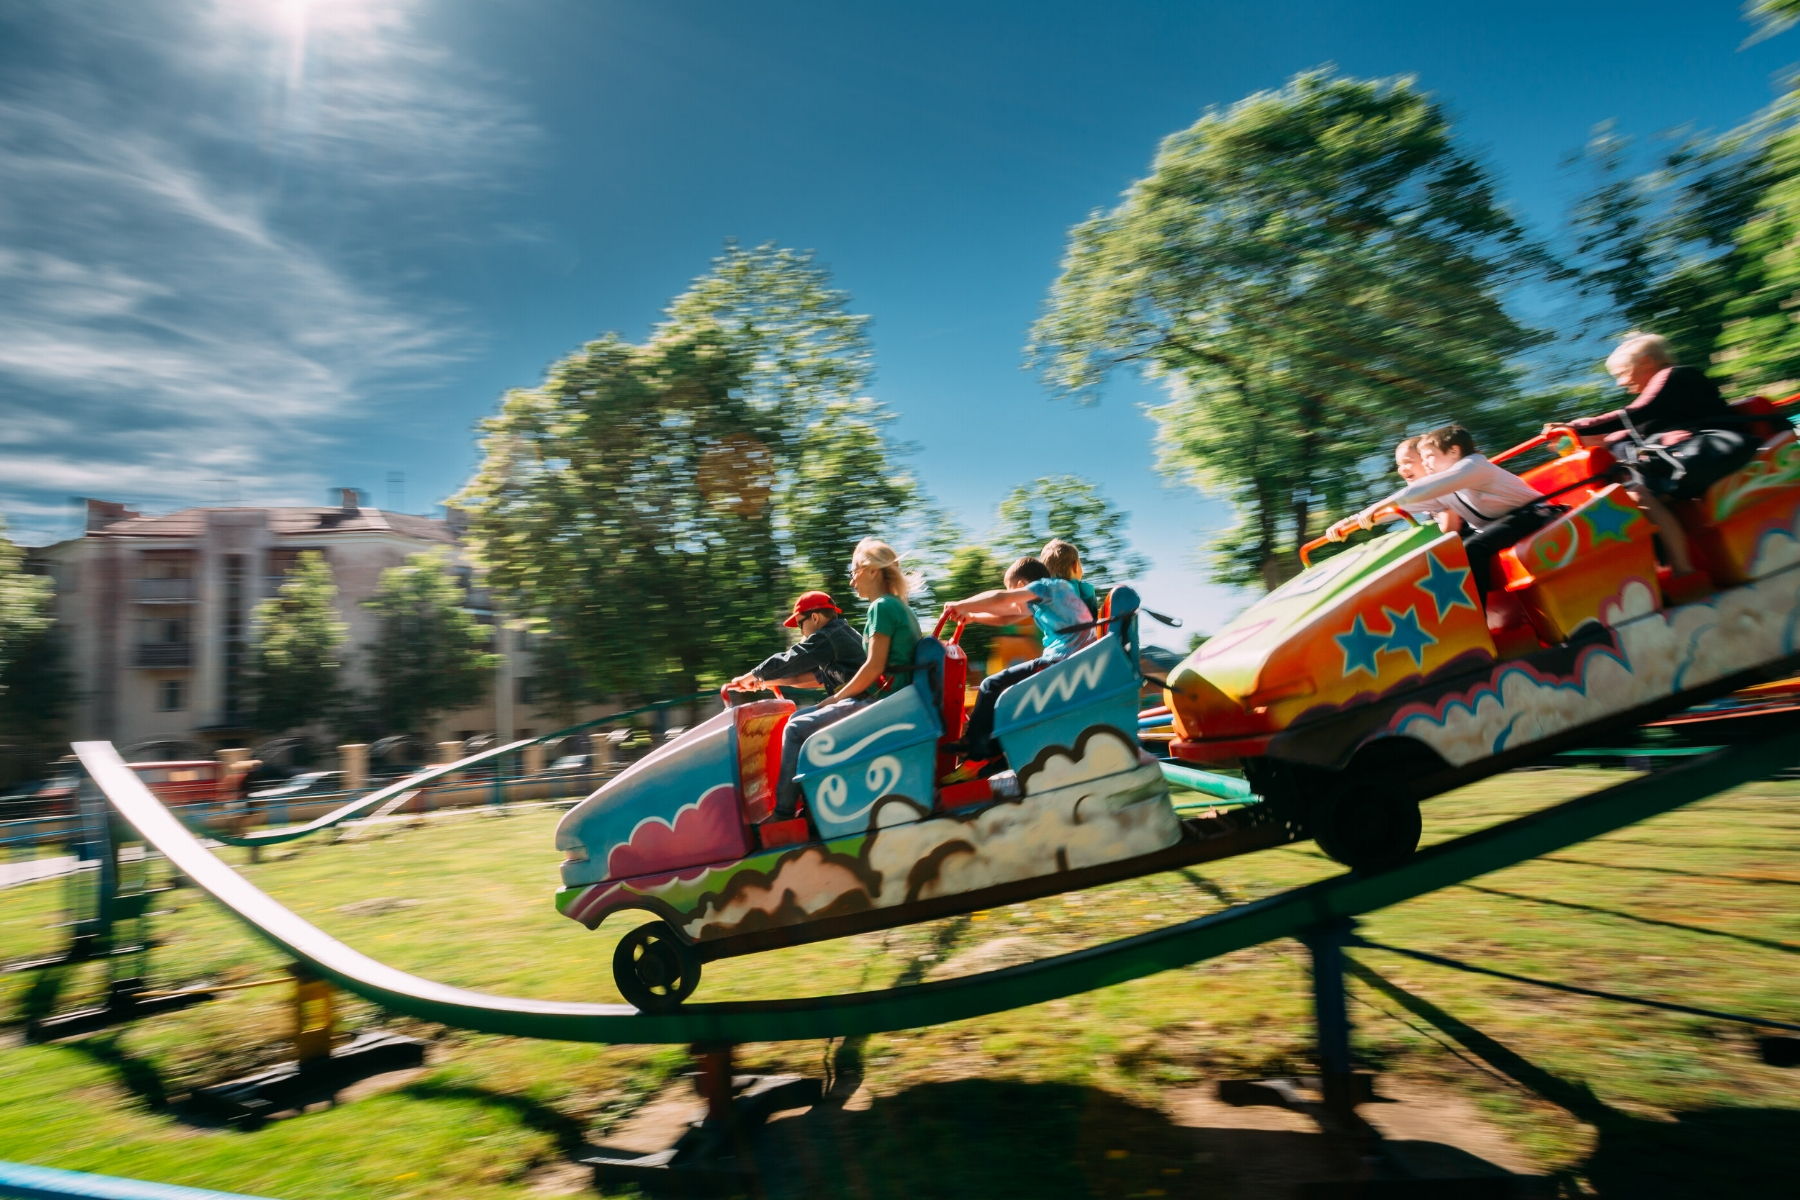 people-having-fun-on-rollercoaster-in-park-photo-PDZXJH7.jpg